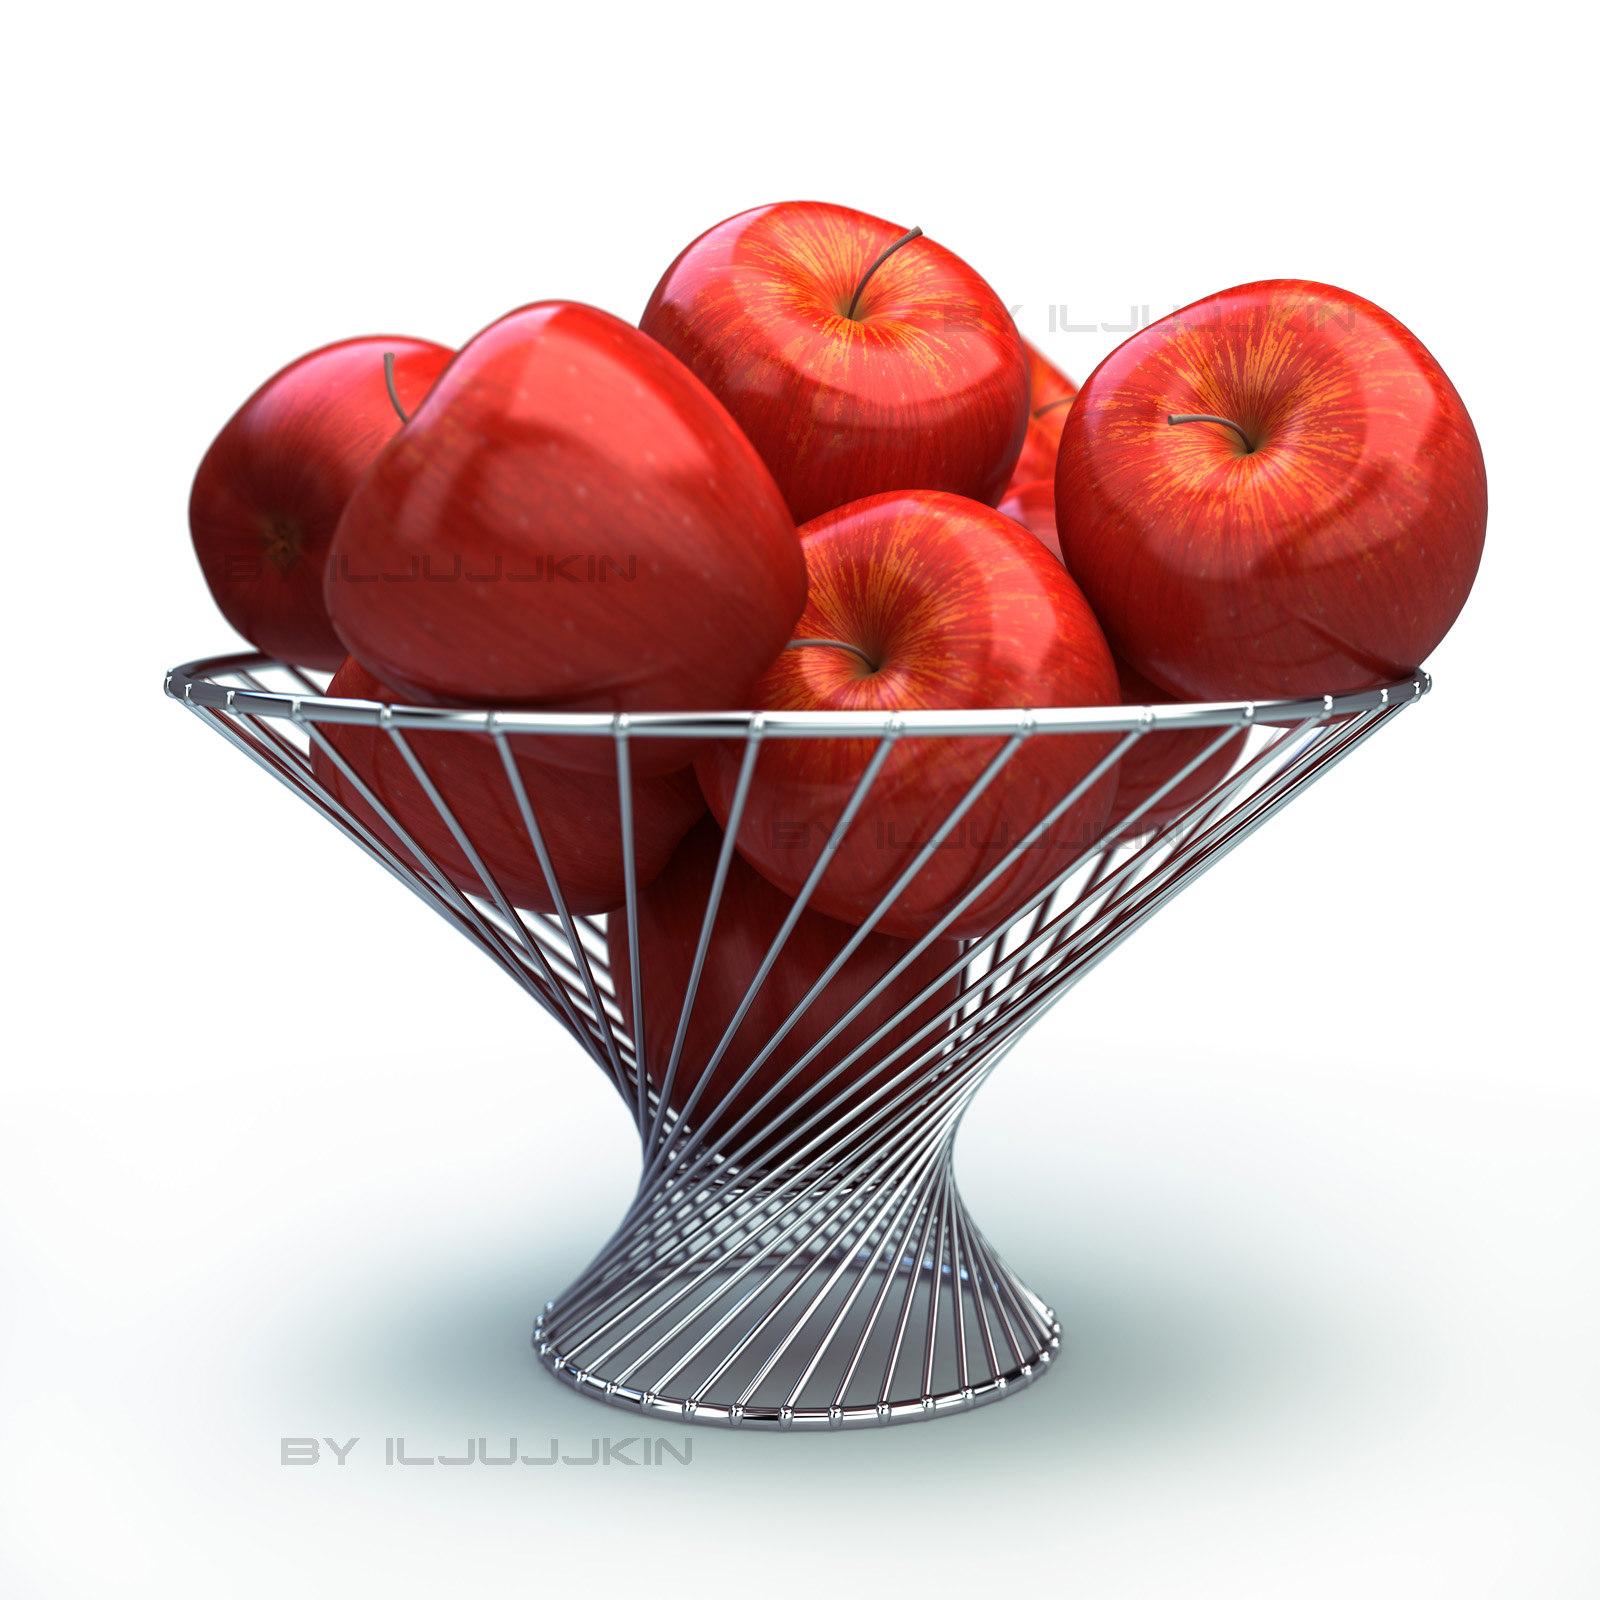 Basket_apple_red_2_vat.jpg